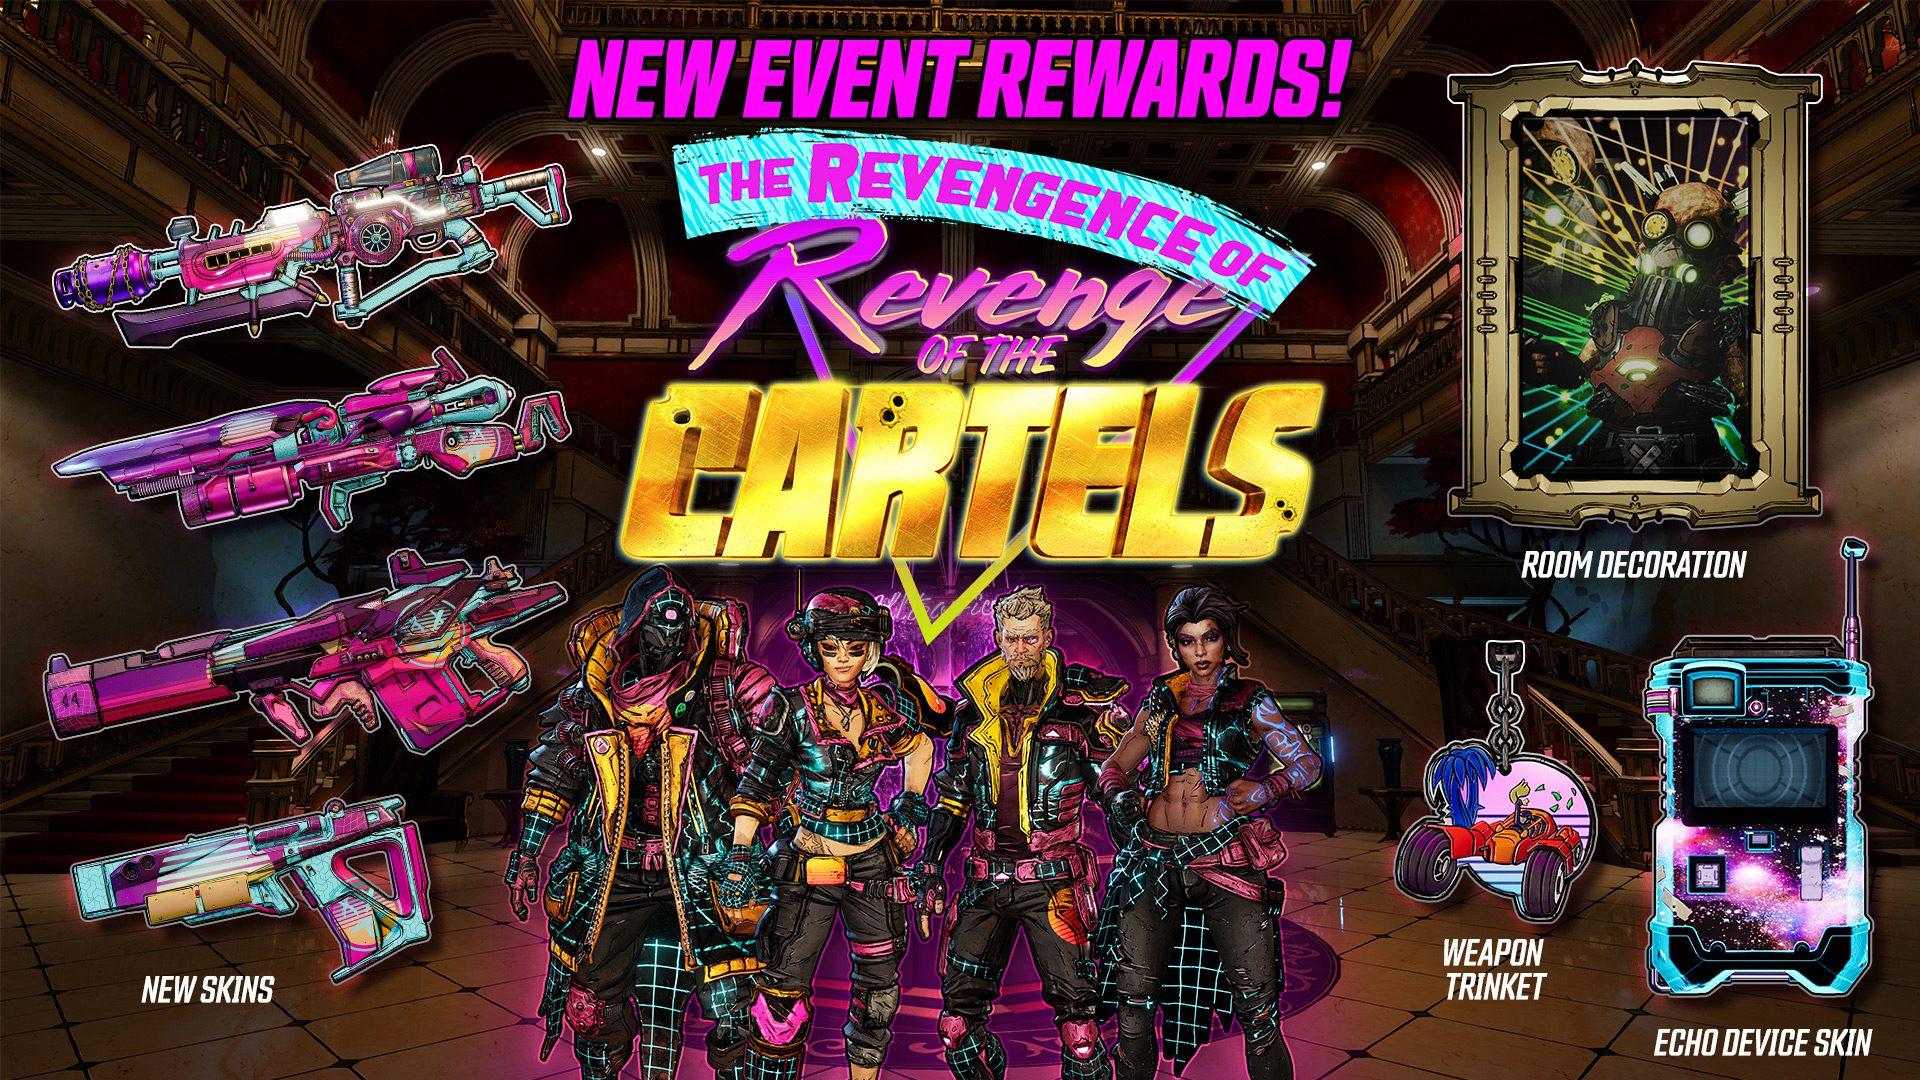 The cosmetic rewards for Revengence of the Revenge of the Cartels